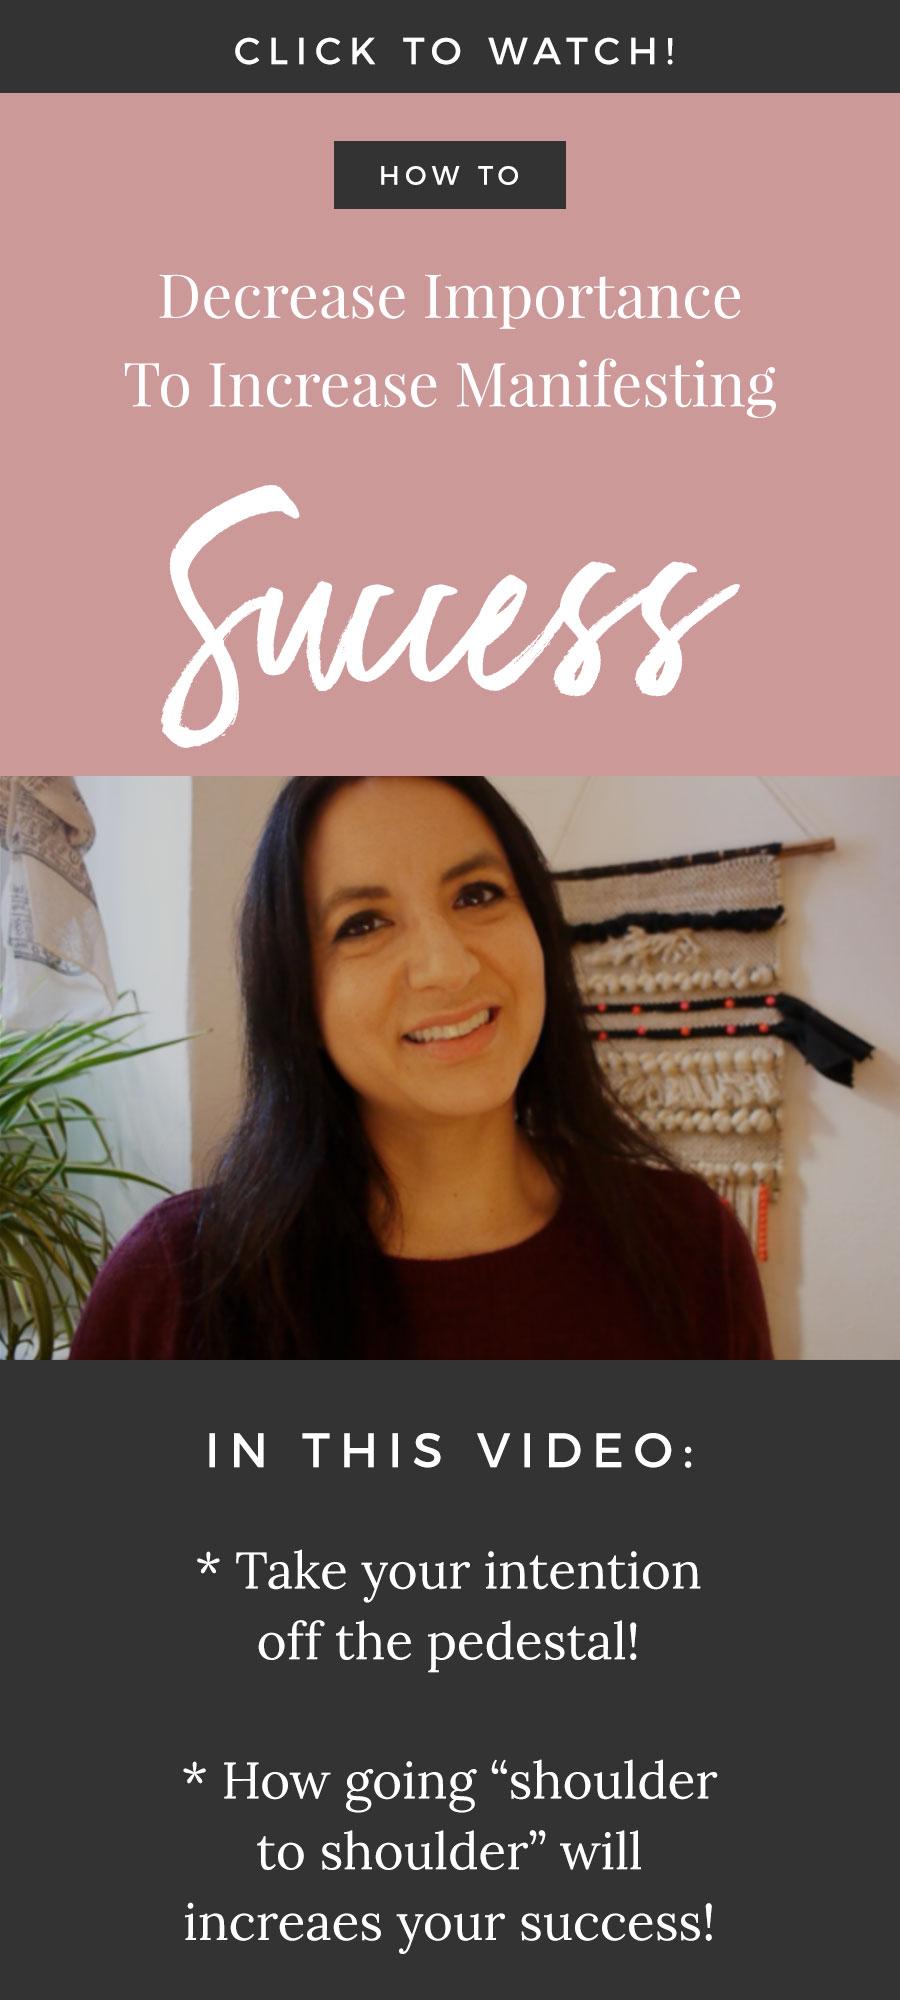 Decrease Importance To Increase Manifesting Success!